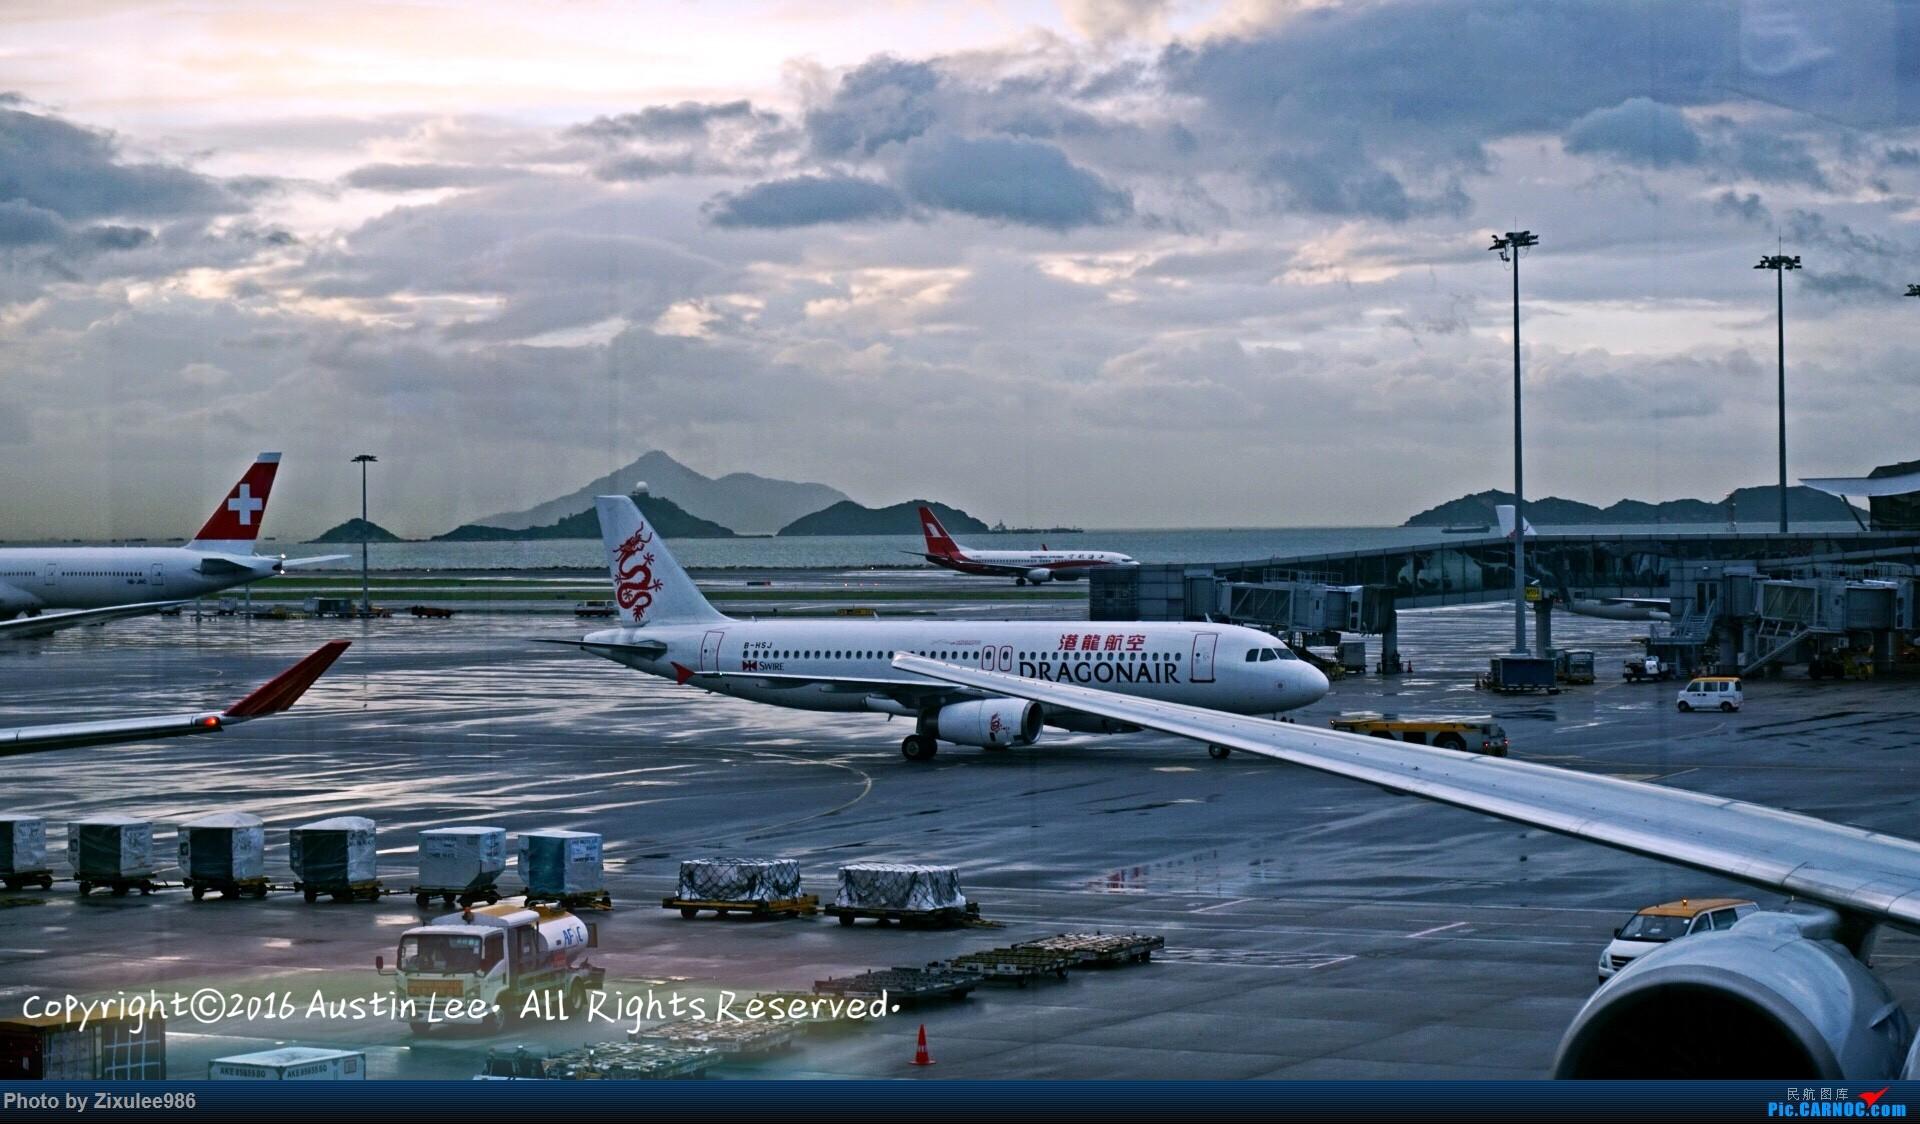 Re:[原创]论坛修复后第一波~三年来旅游途中的拍机精选~不定时更新 AIRBUS A320-232 B-HSJ 中国香港国际机场